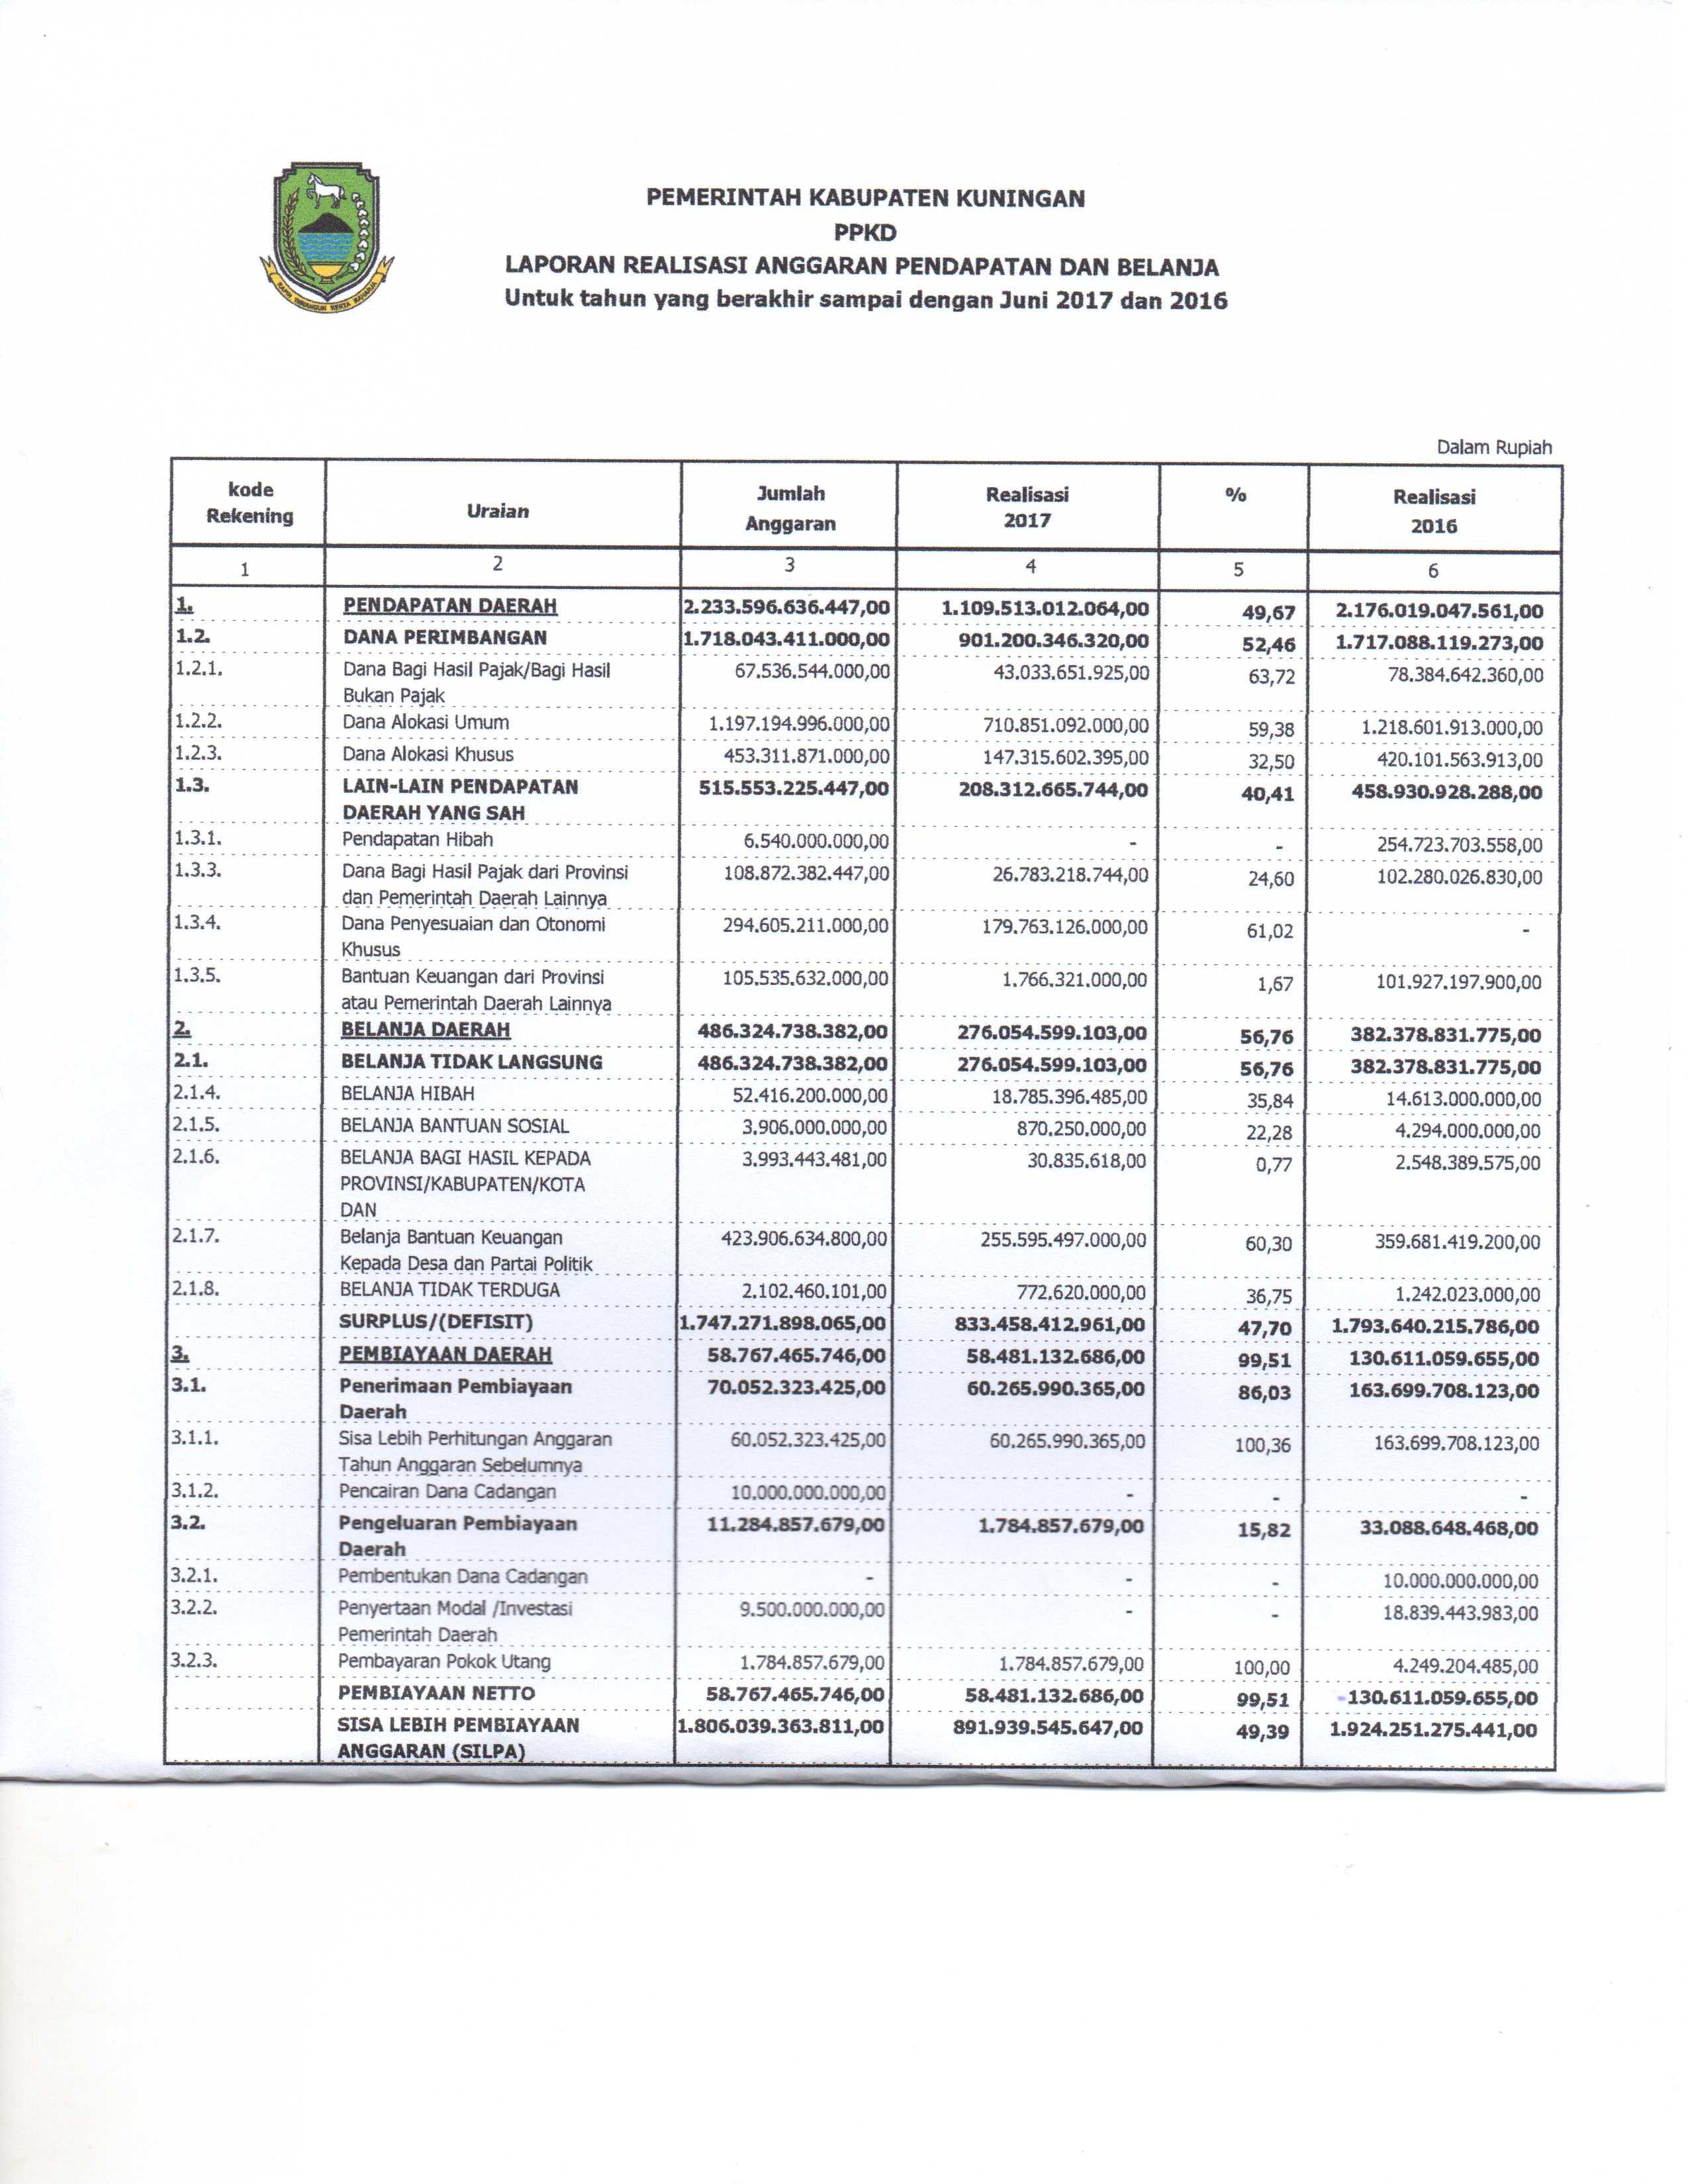 Transparansi Pengelolaan Anggaran Daerah Pemerintah Kabupaten Kuningan